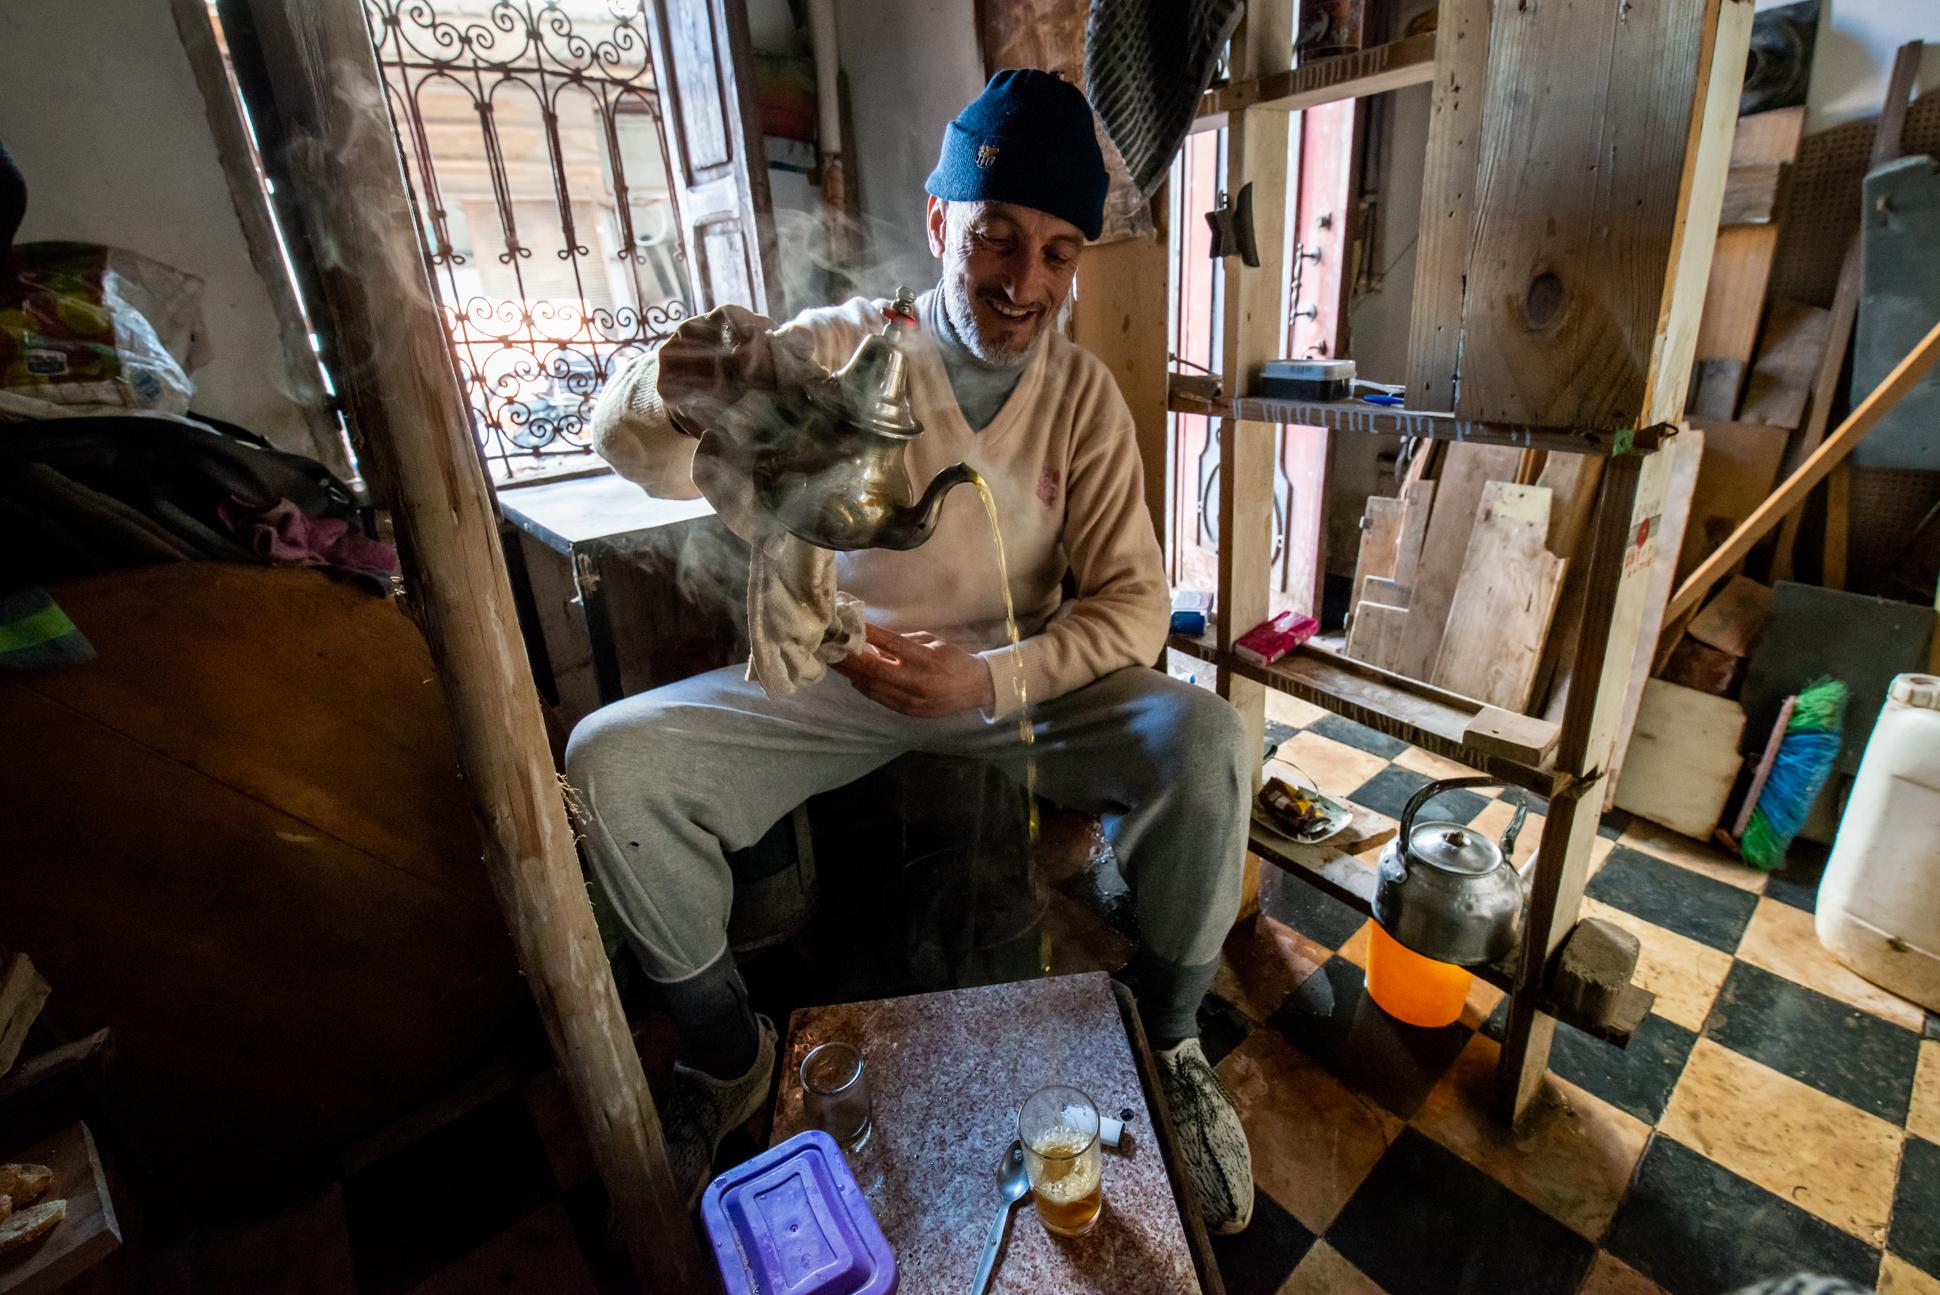 Moroccon man making Moroccon whisky, sweet mint tea. Environmental portrait by Ellis & Me.